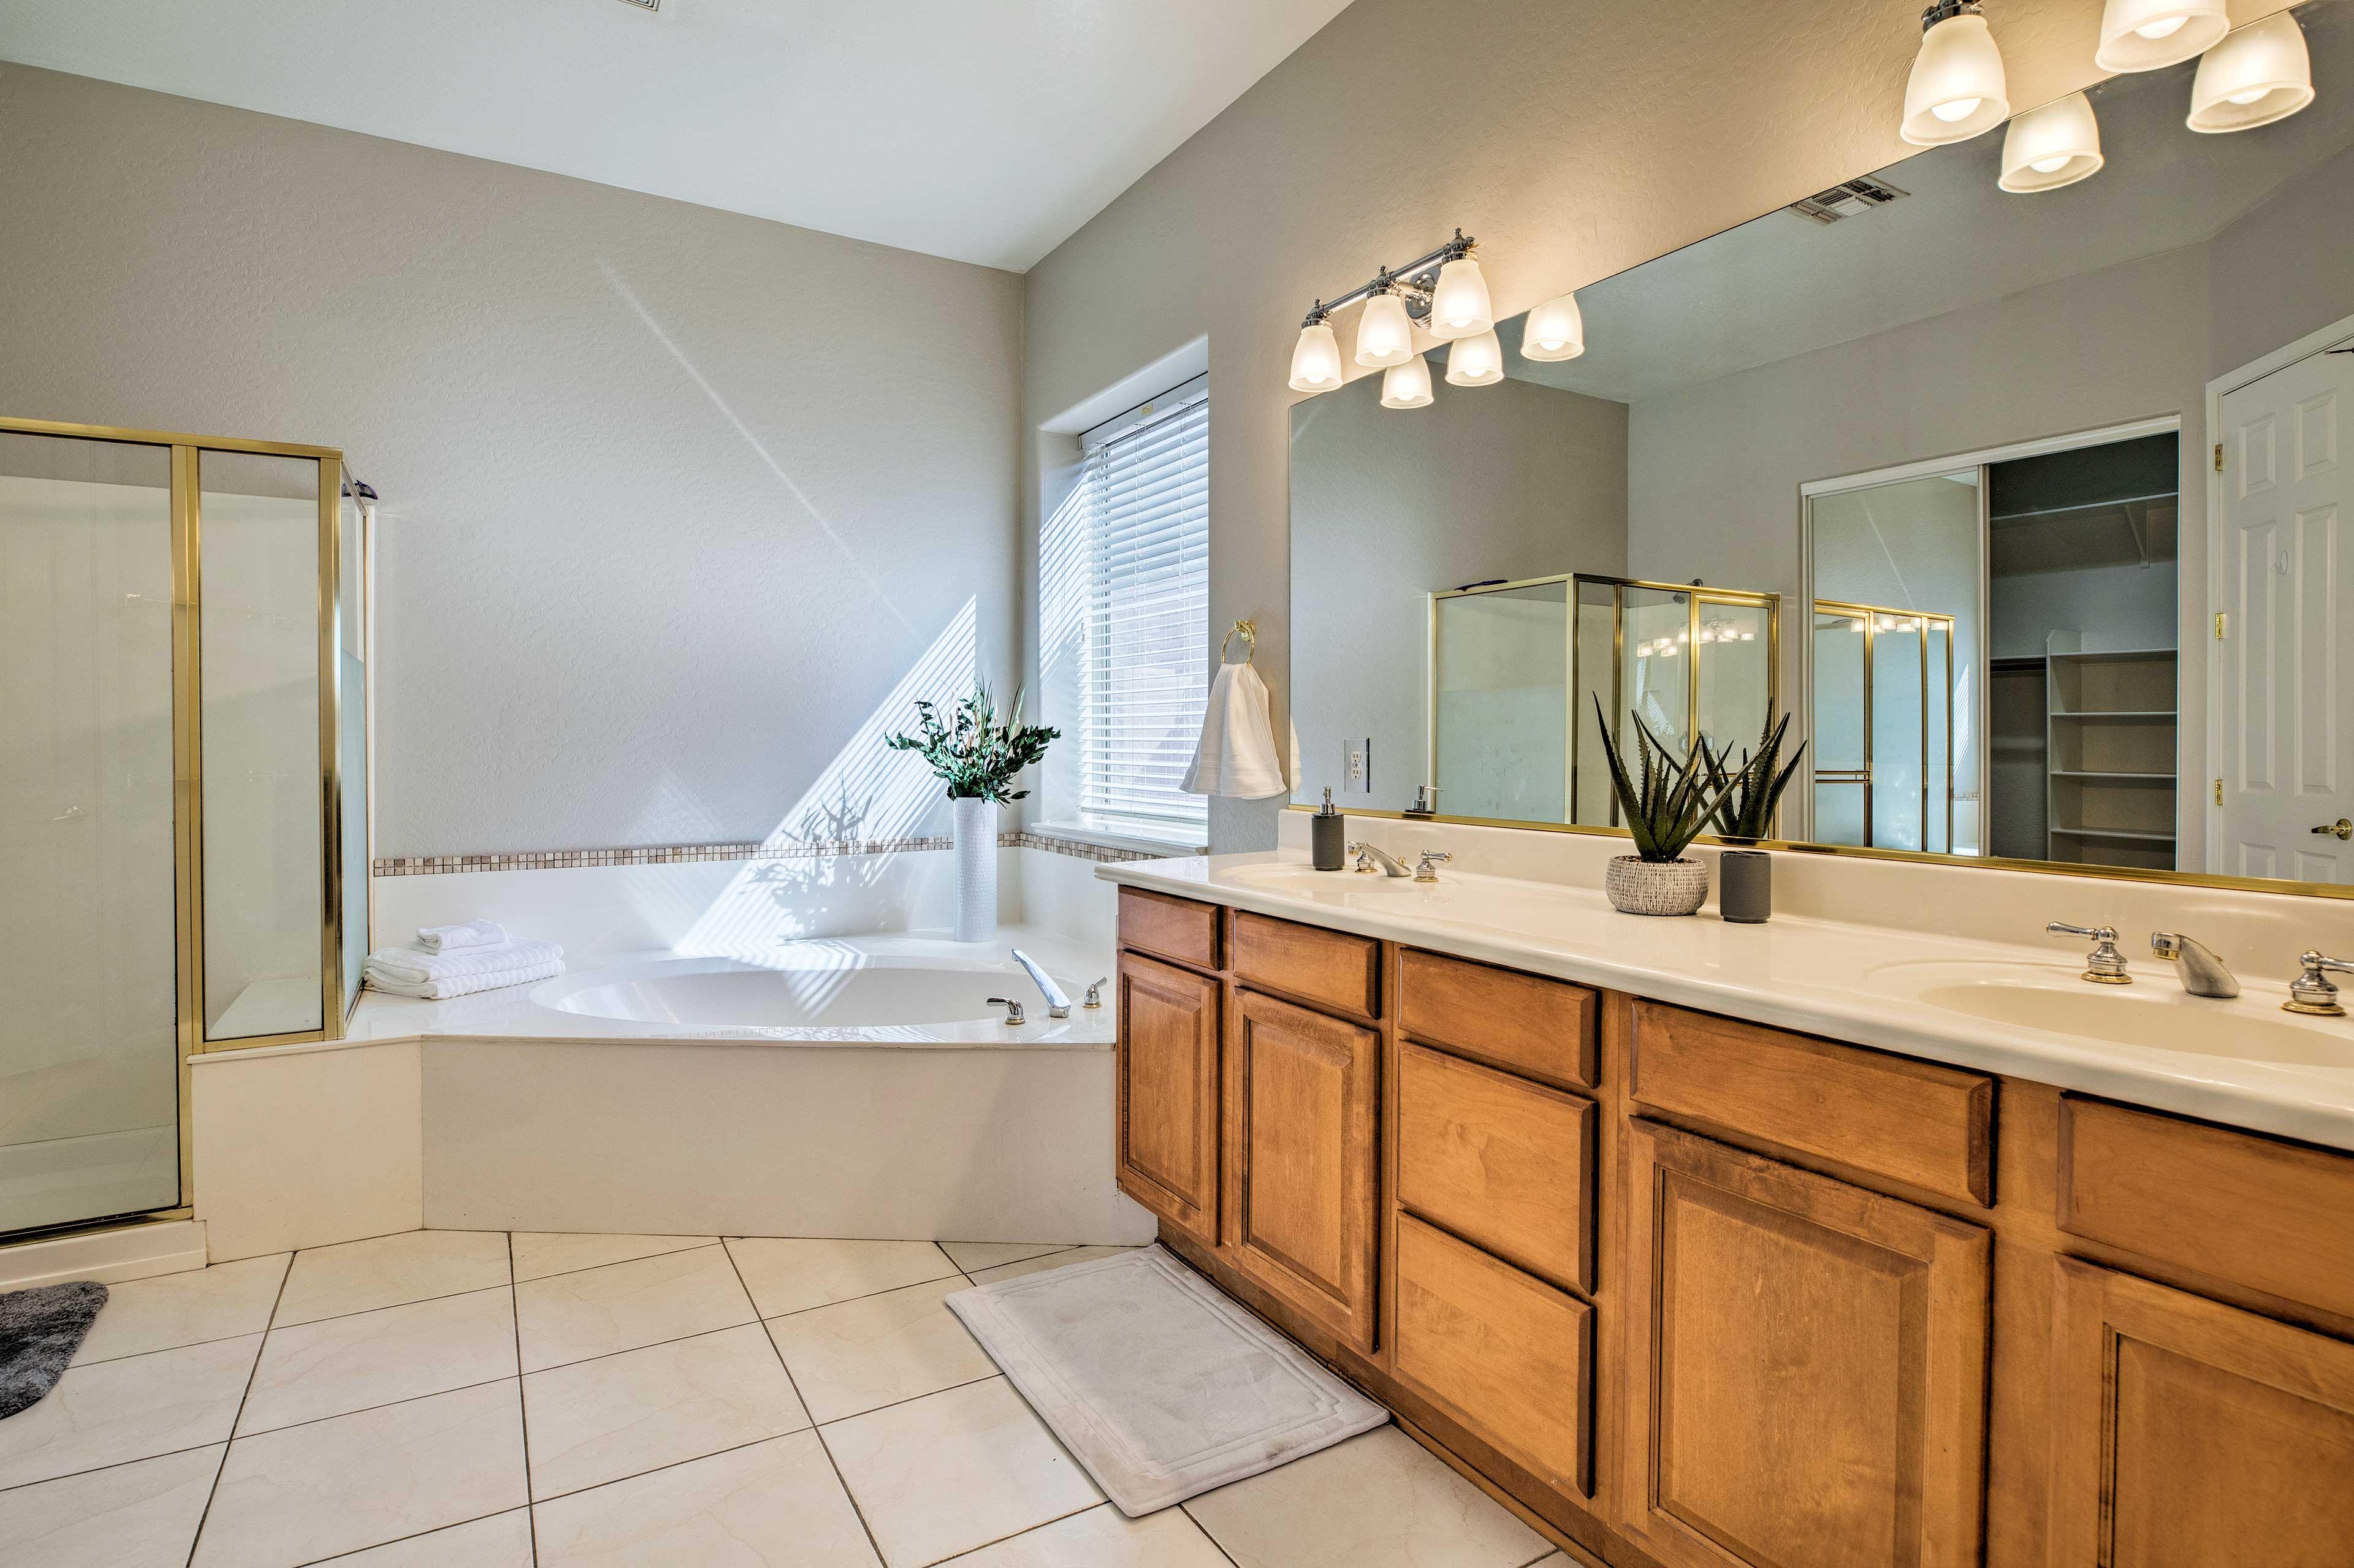 Double sinks, a deep soaking tub, & a walk-in shower make up the en-suite bath.